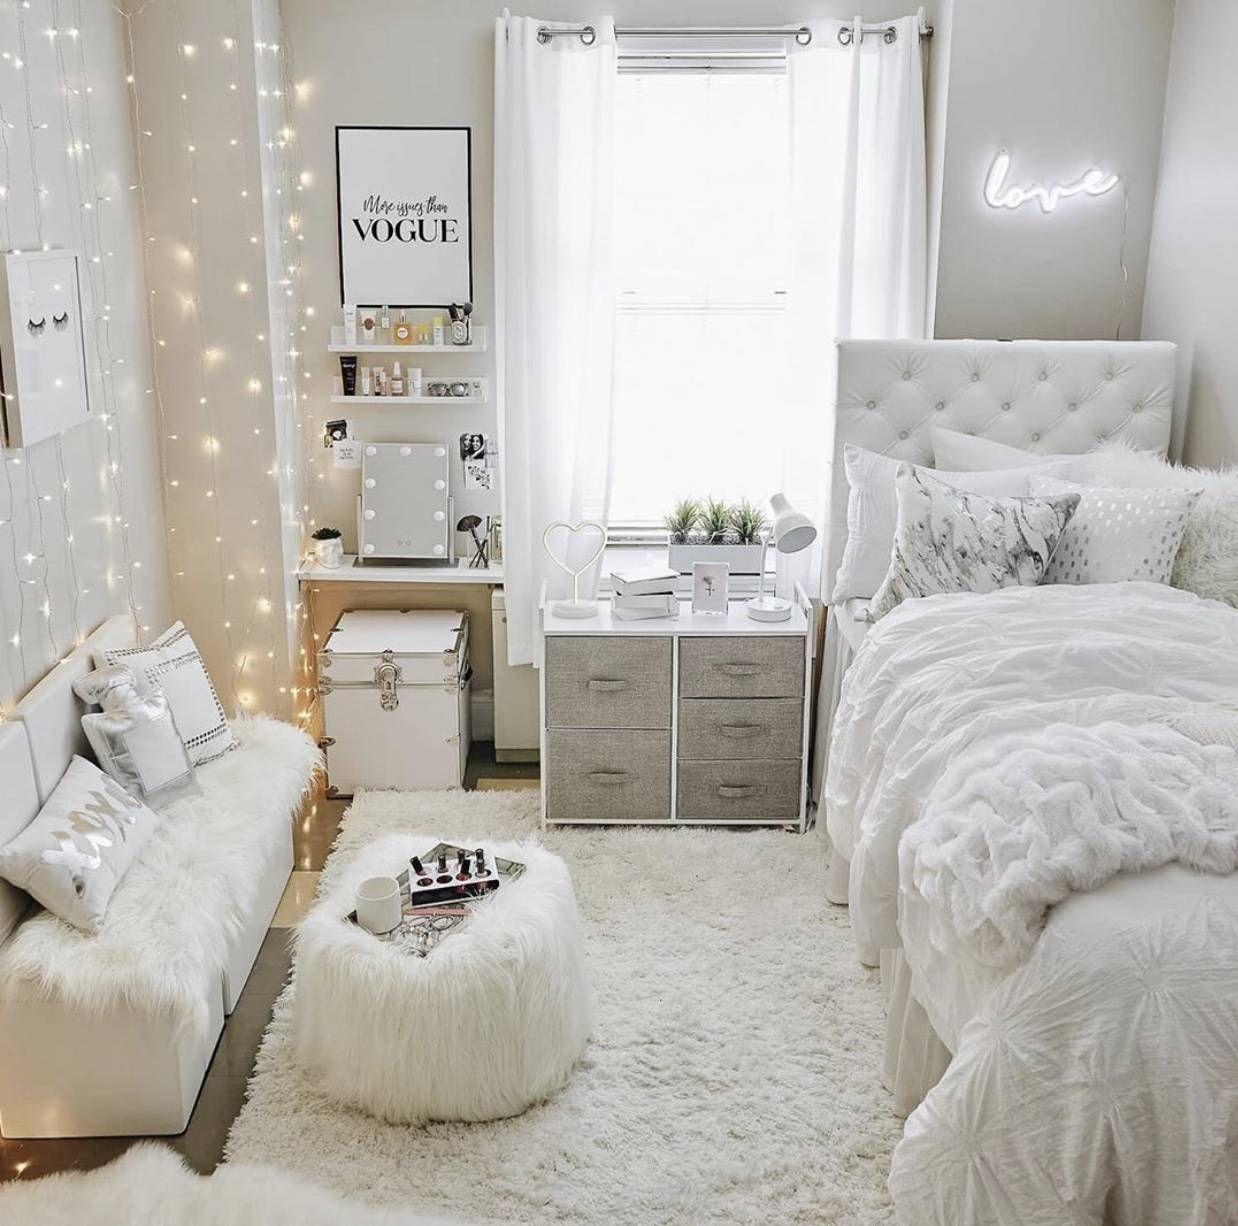 VSCO Room Ideas: How to Create a Cute Vsco Room -   - #bestbathroomdecor #bestkitchendecor #bestlivingroomdecor #create #Cute #decoratingideasforthehome #diyhomeonabudget #diyhomeplants #diykitchendecor #ideas #Room #roomdecoration #VSCO #dormroomideas